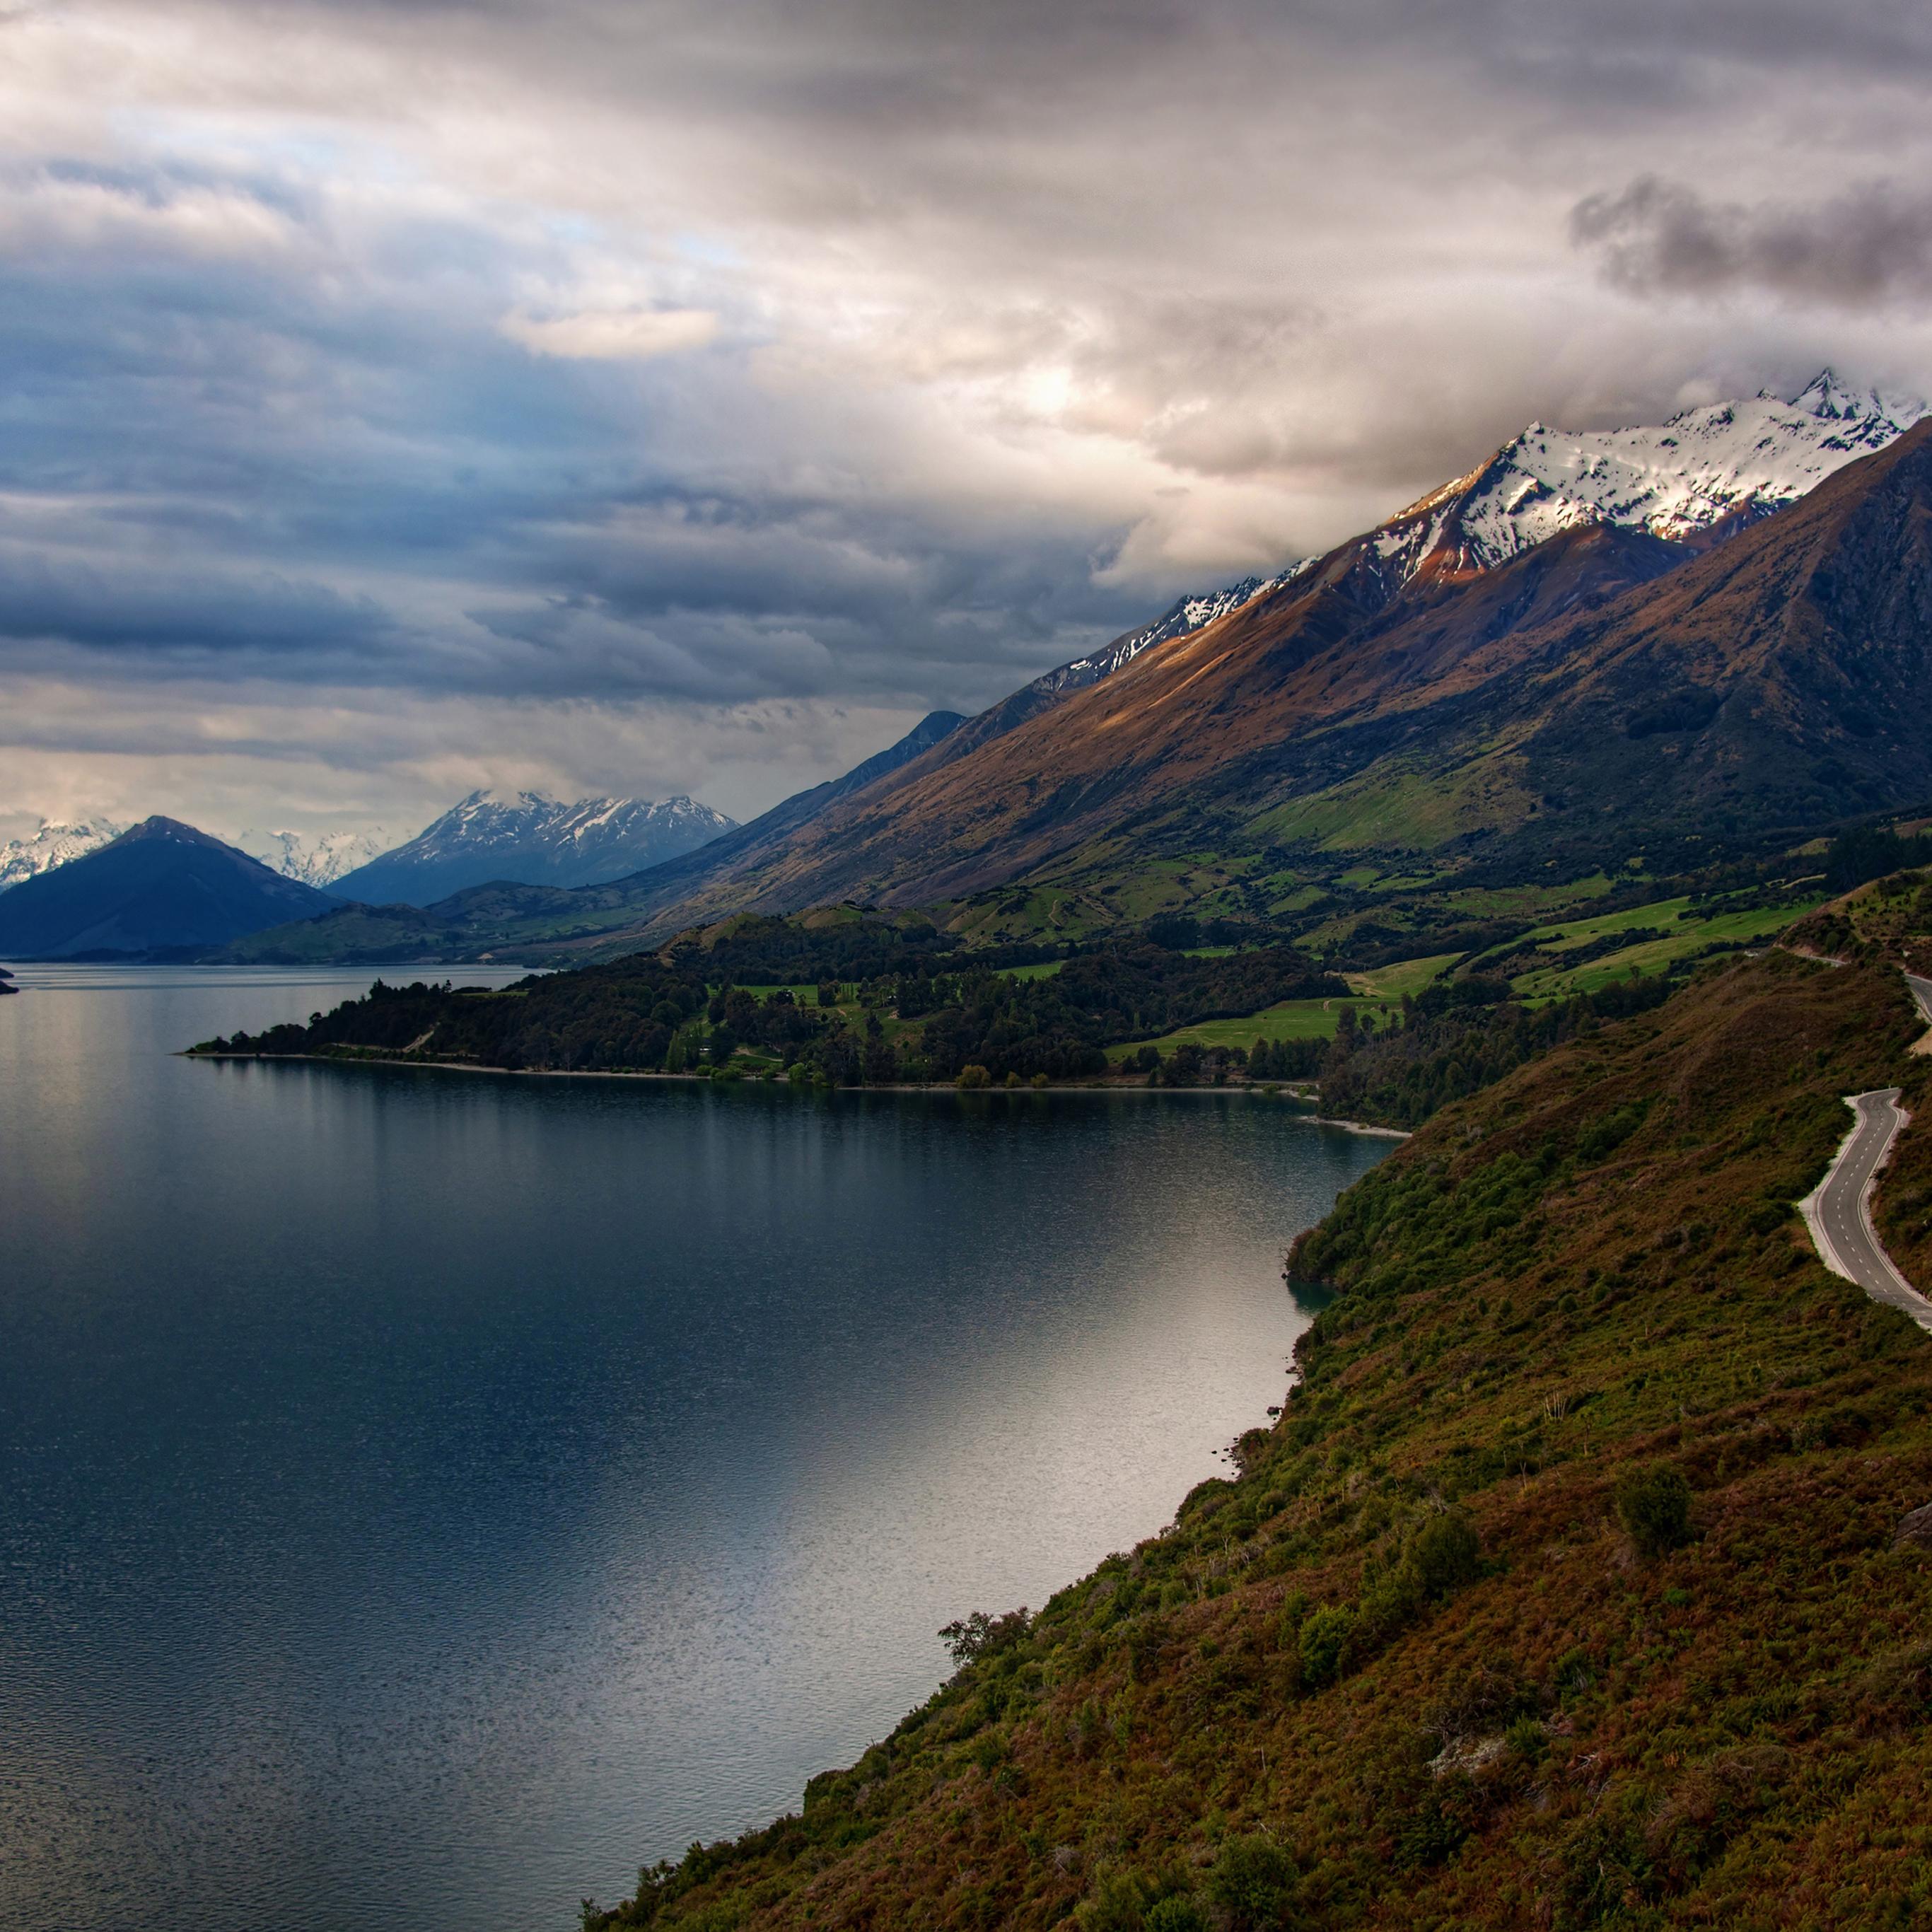 Mg56 Beautiful Road In World Mountain Lake Nature